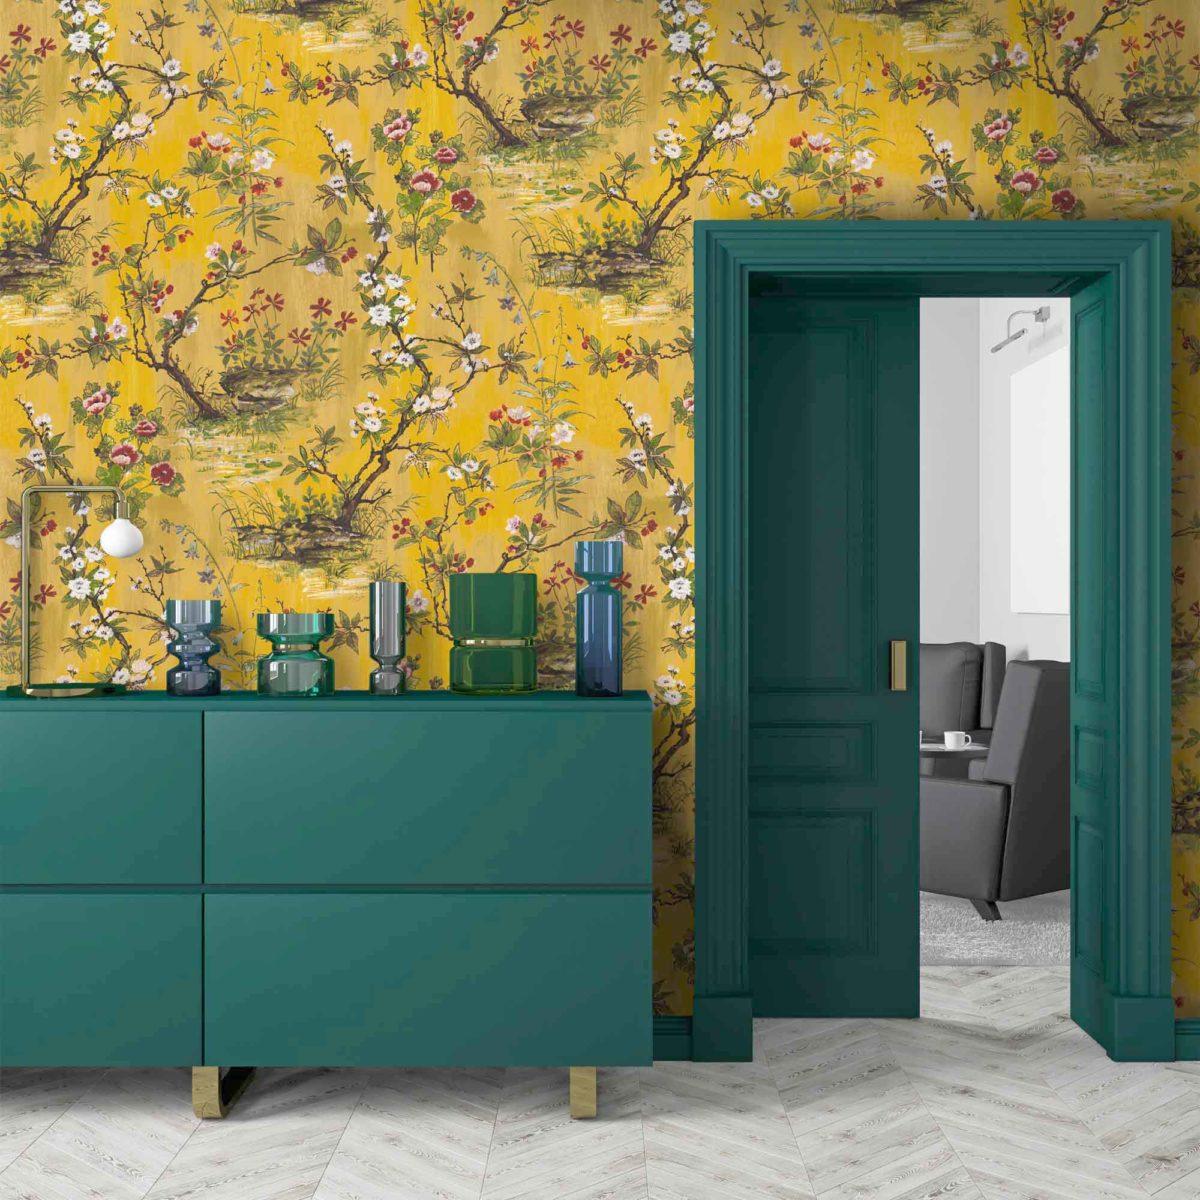 20woodchip-and-magnolia_rivington-in-yellow-wallpaper-1200x1200.jpg